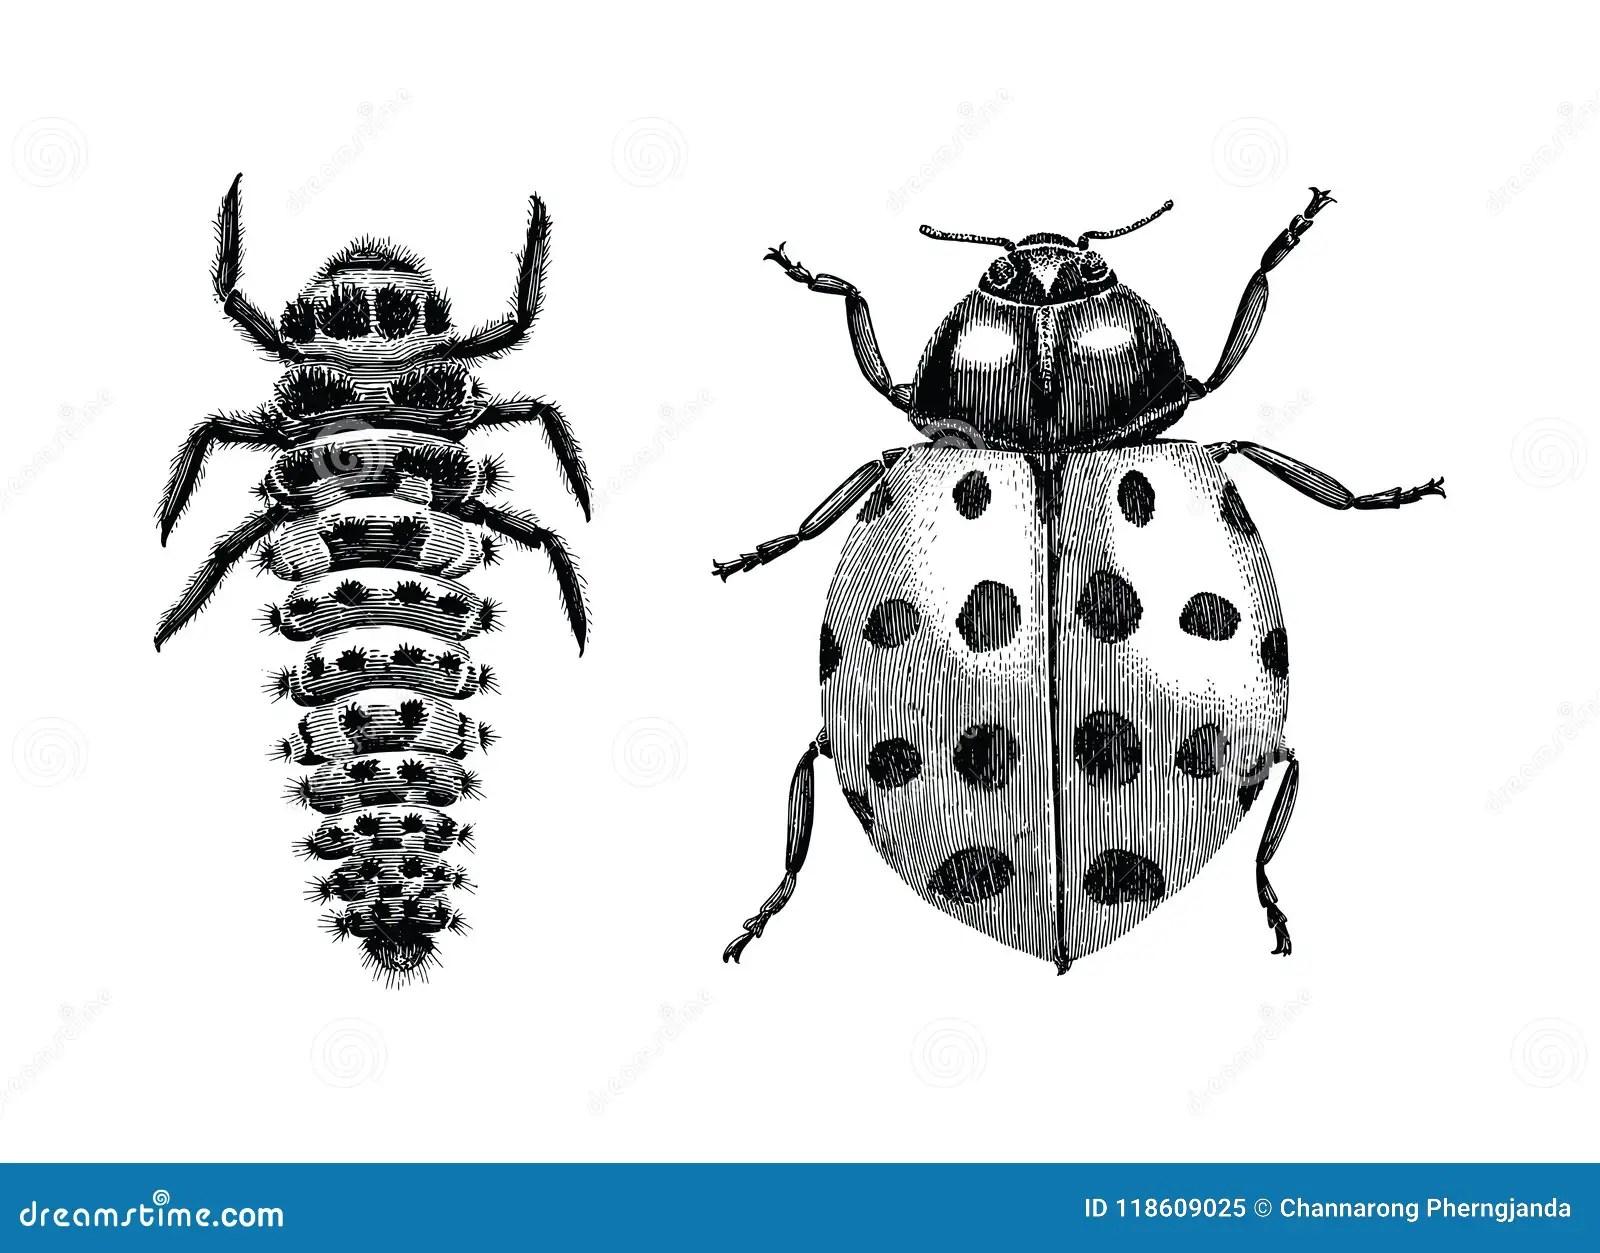 Multicolored Asian Lady Beetle Larva And Adult Lady Beetle